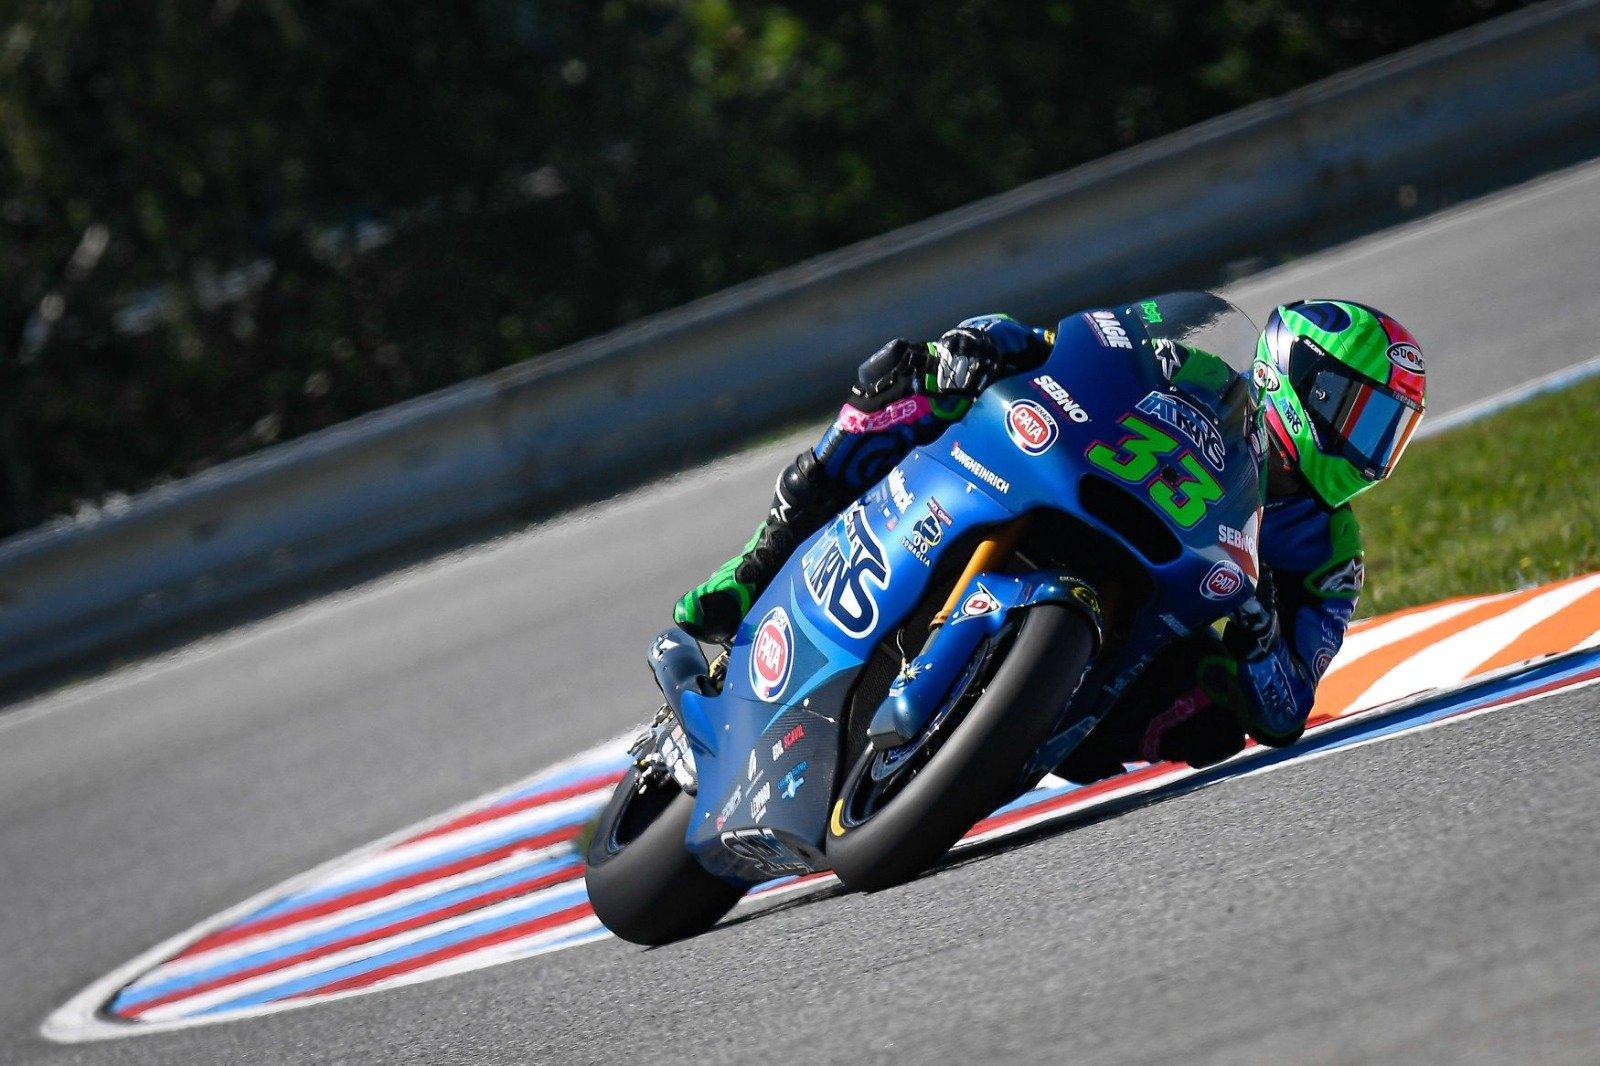 Enea Bastianini domina como una bestia la carrera de Moto2 en Brno